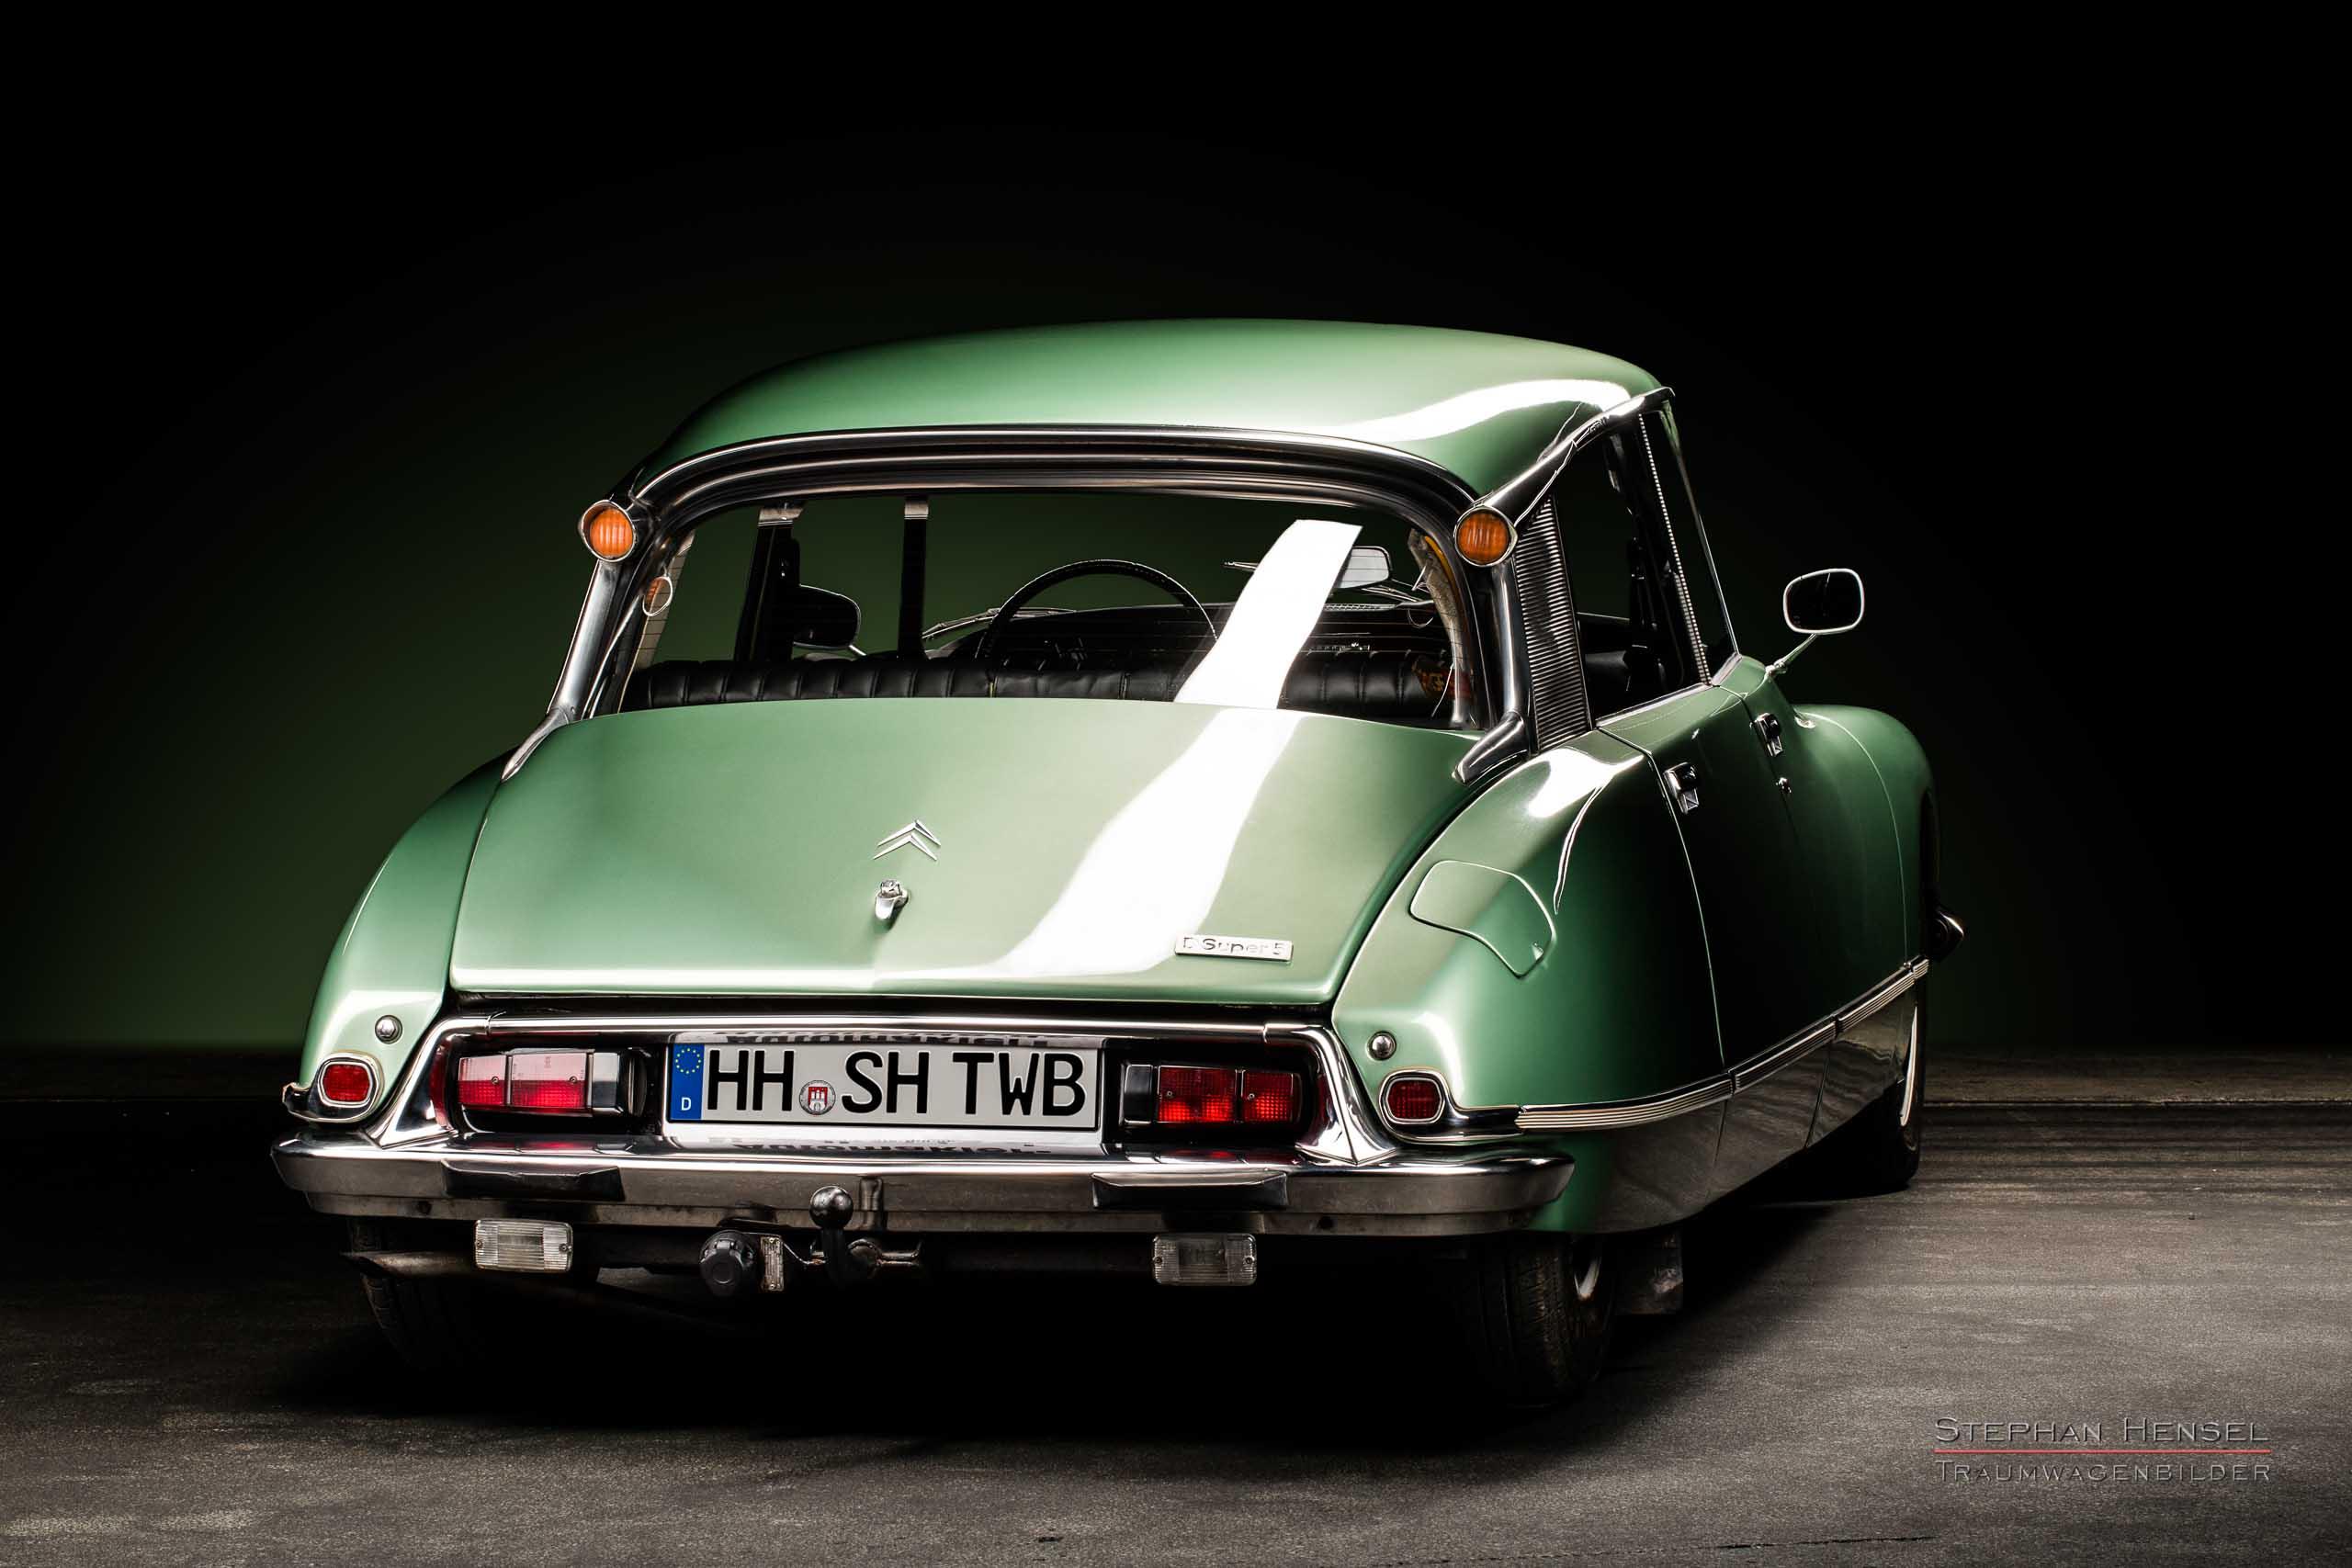 Citroën DSuper5, Ansicht von hinten rechts, Autofotograf: Stephan Hensel, Oldtimerfotograf, Hamburg